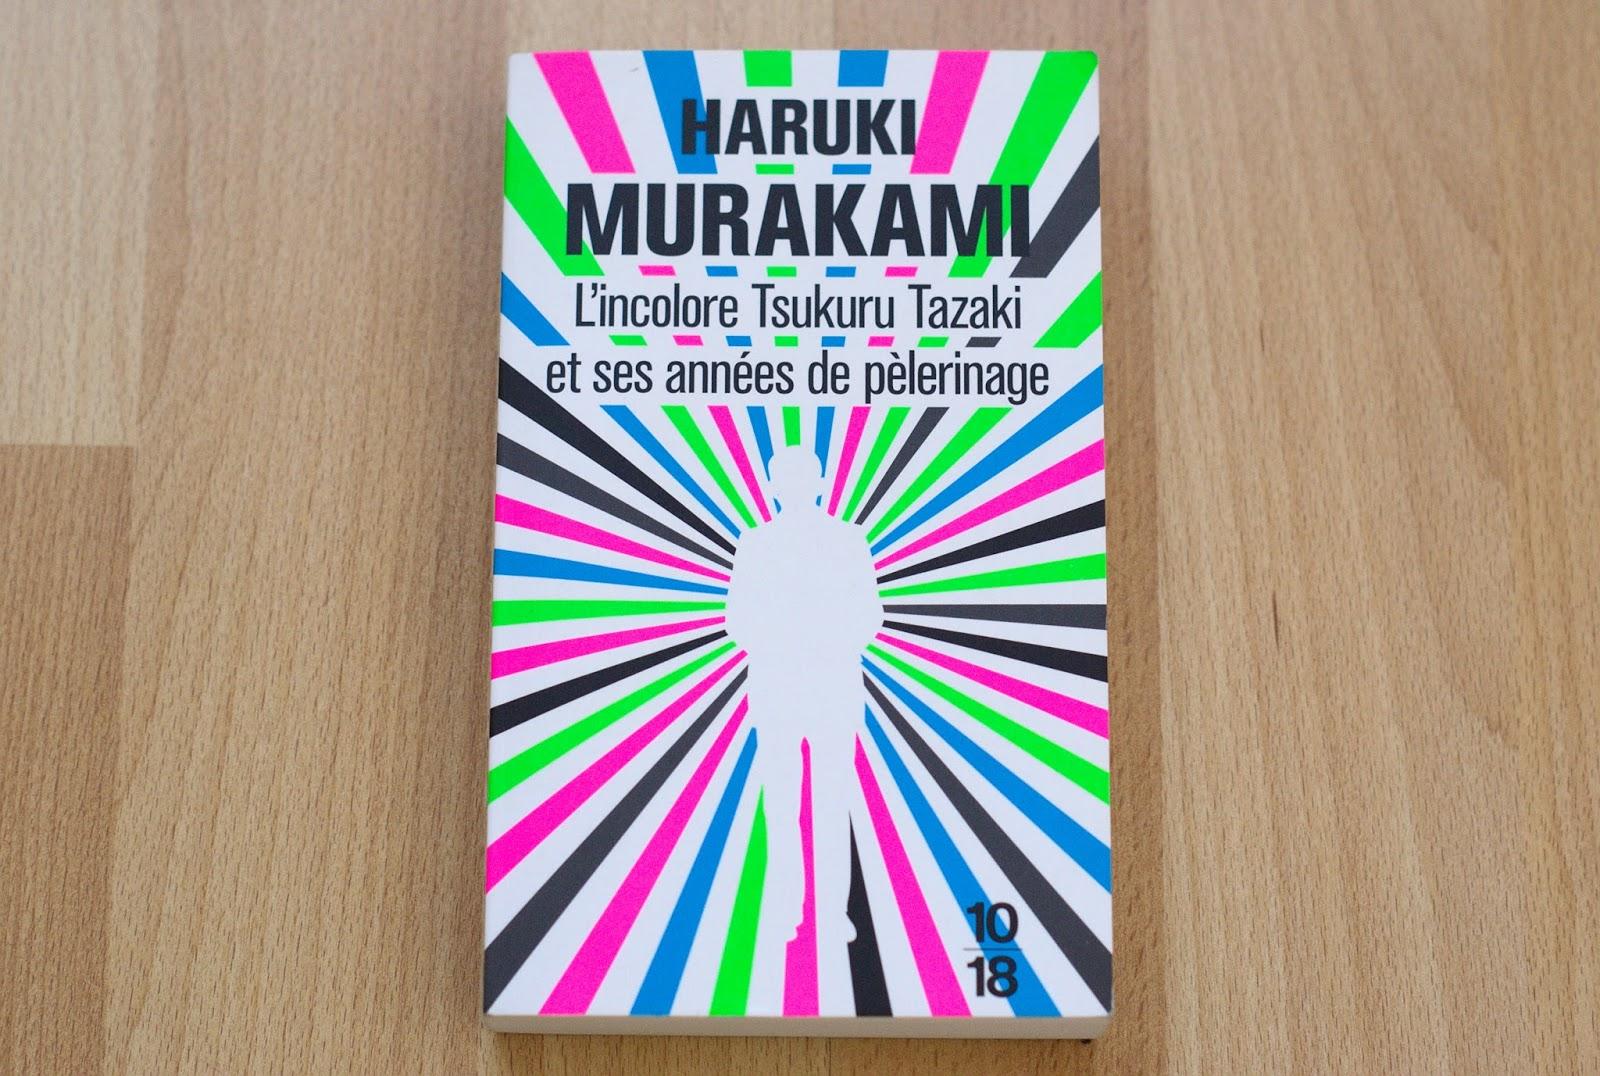 tsukuru tazaki haruki murakami livre book 10 18